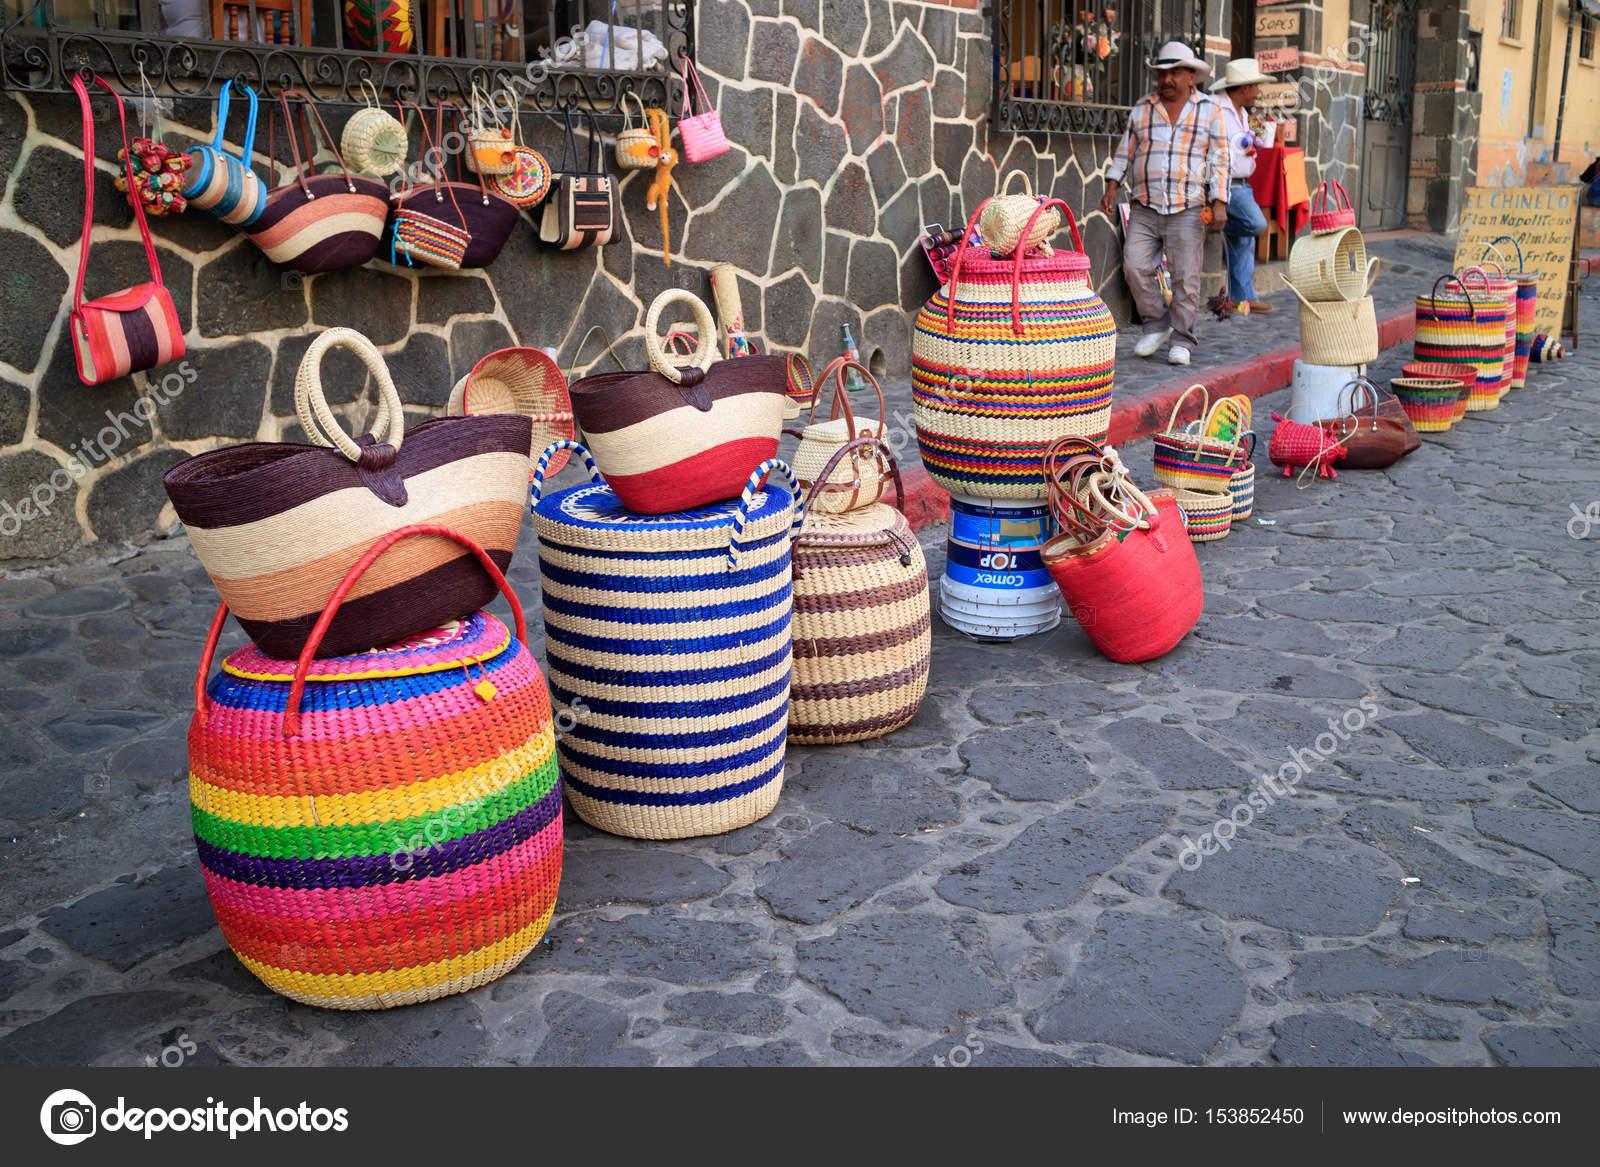 56a27d69f3 Carteras del mercado de Tepoztlán– imagen de stock